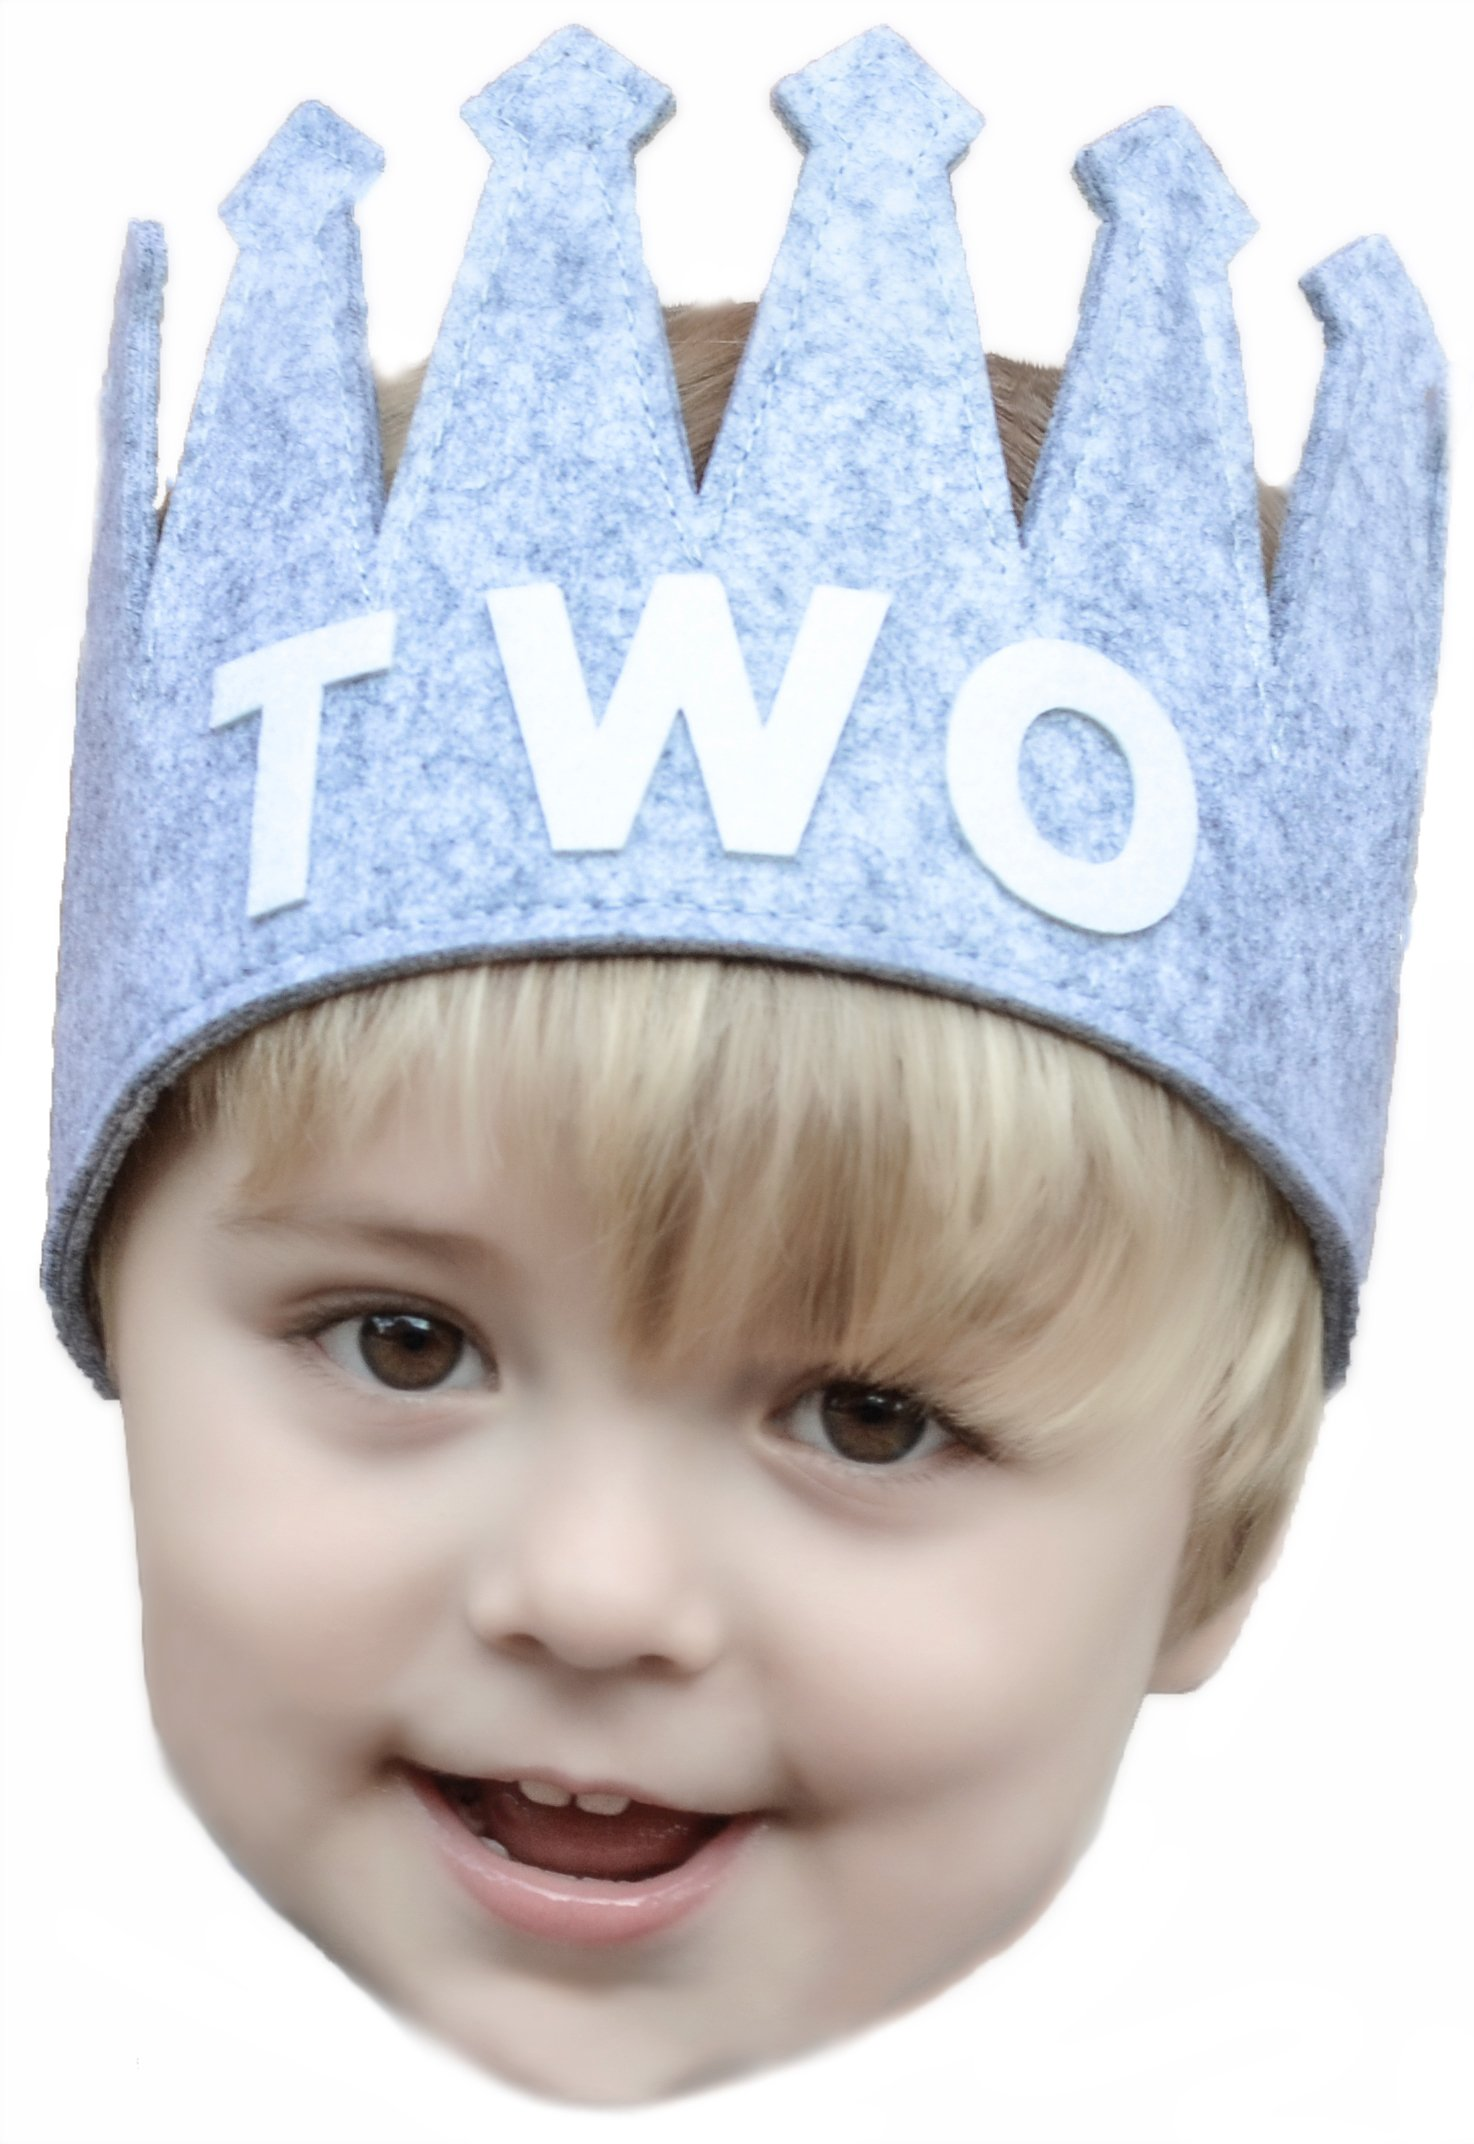 Amazon Second Birthday Boy Shirt 2nd Birthday Shirt for Boys